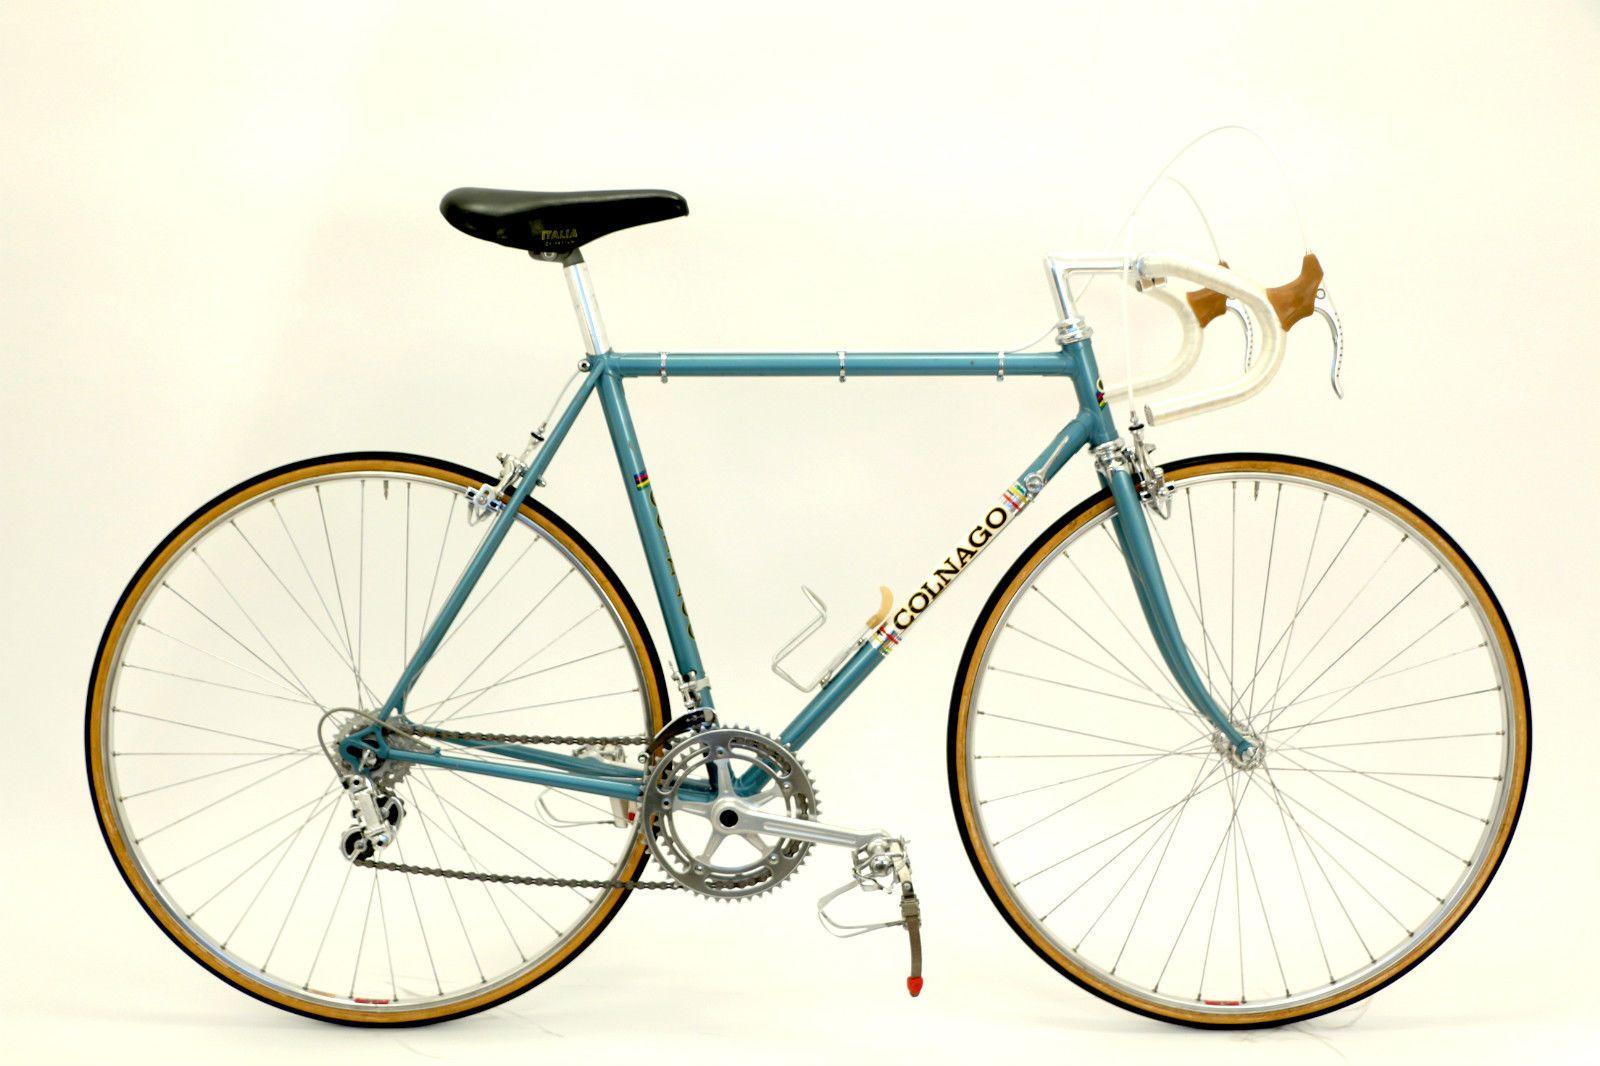 Colnago Super Campagnolo Nuovo Record Vintage (1974-1975) | Splendid ...